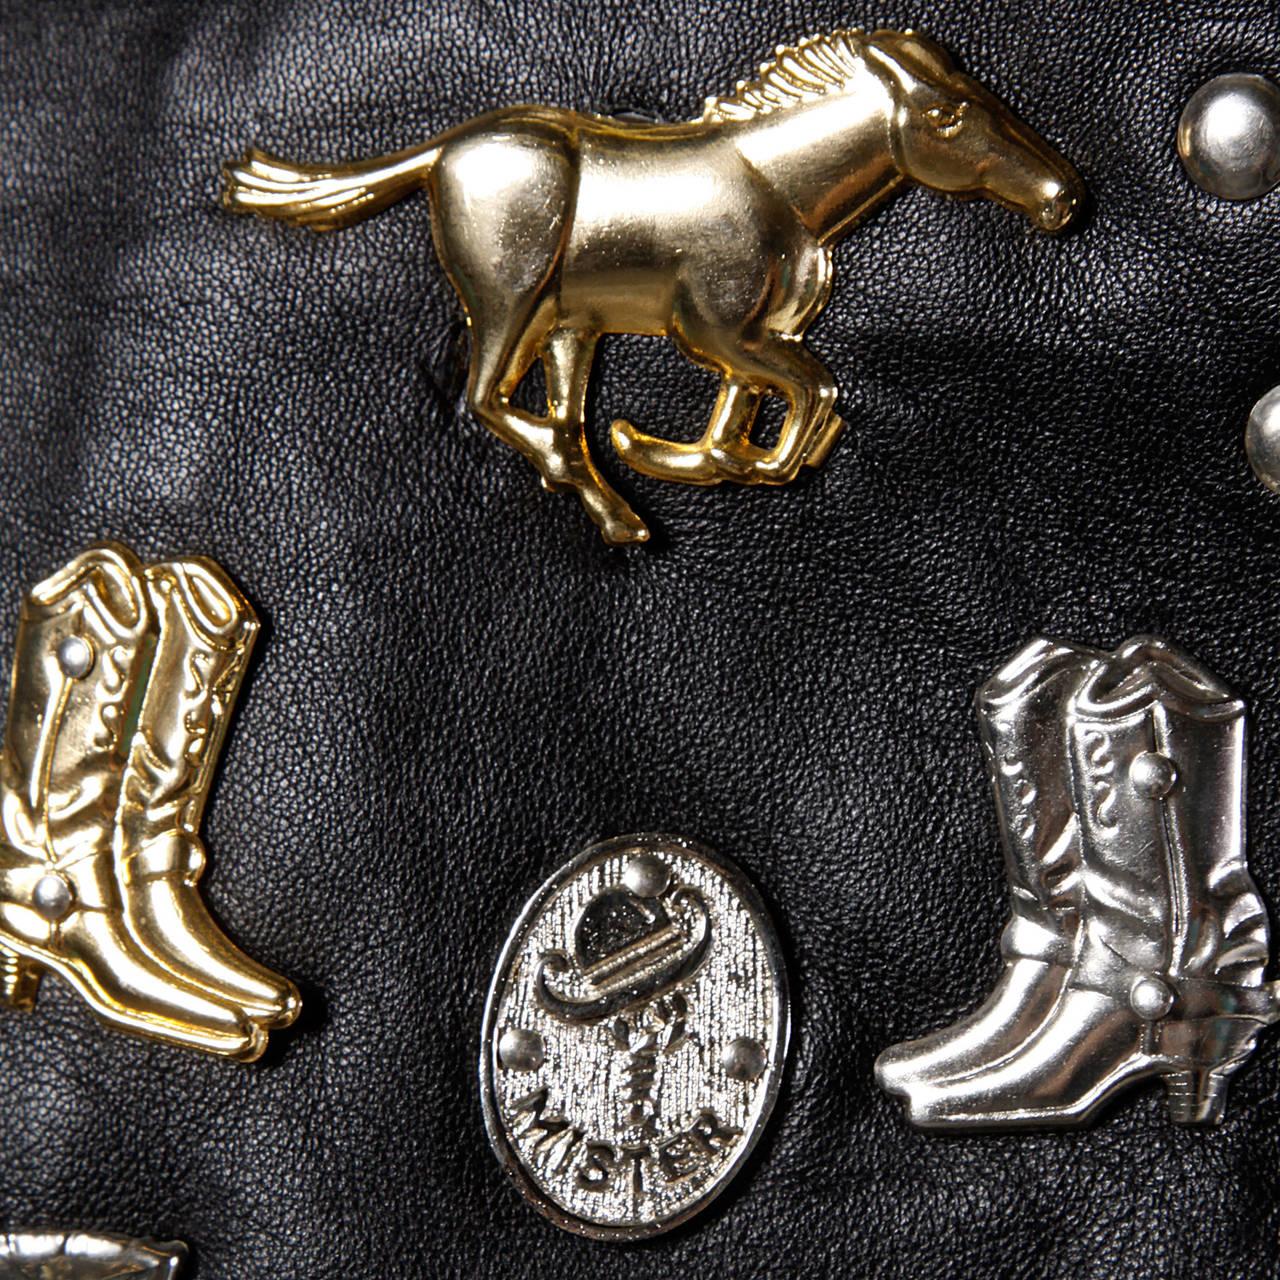 Vintage Leather Vest with Concho, Cowboy Boots, + Horse Studs 3